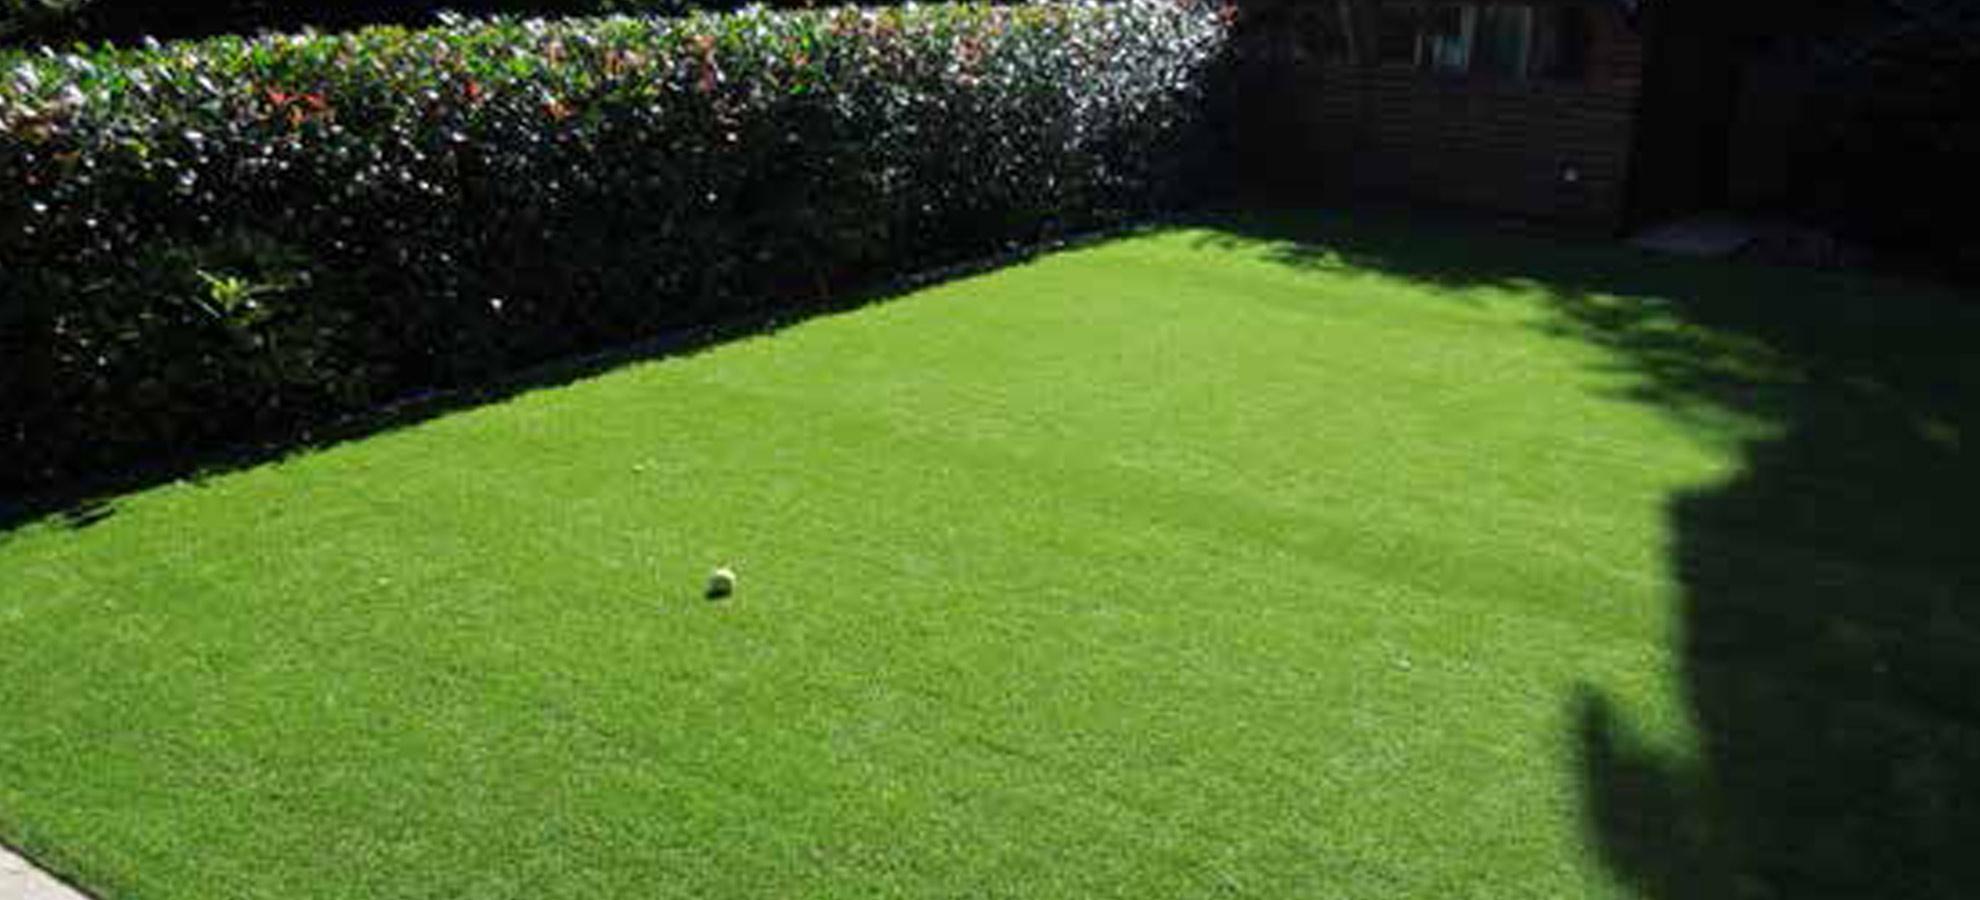 carpet-fit-wales-artificial-grass-great-value-improving-your-garden-aberdare-summer artificial grass